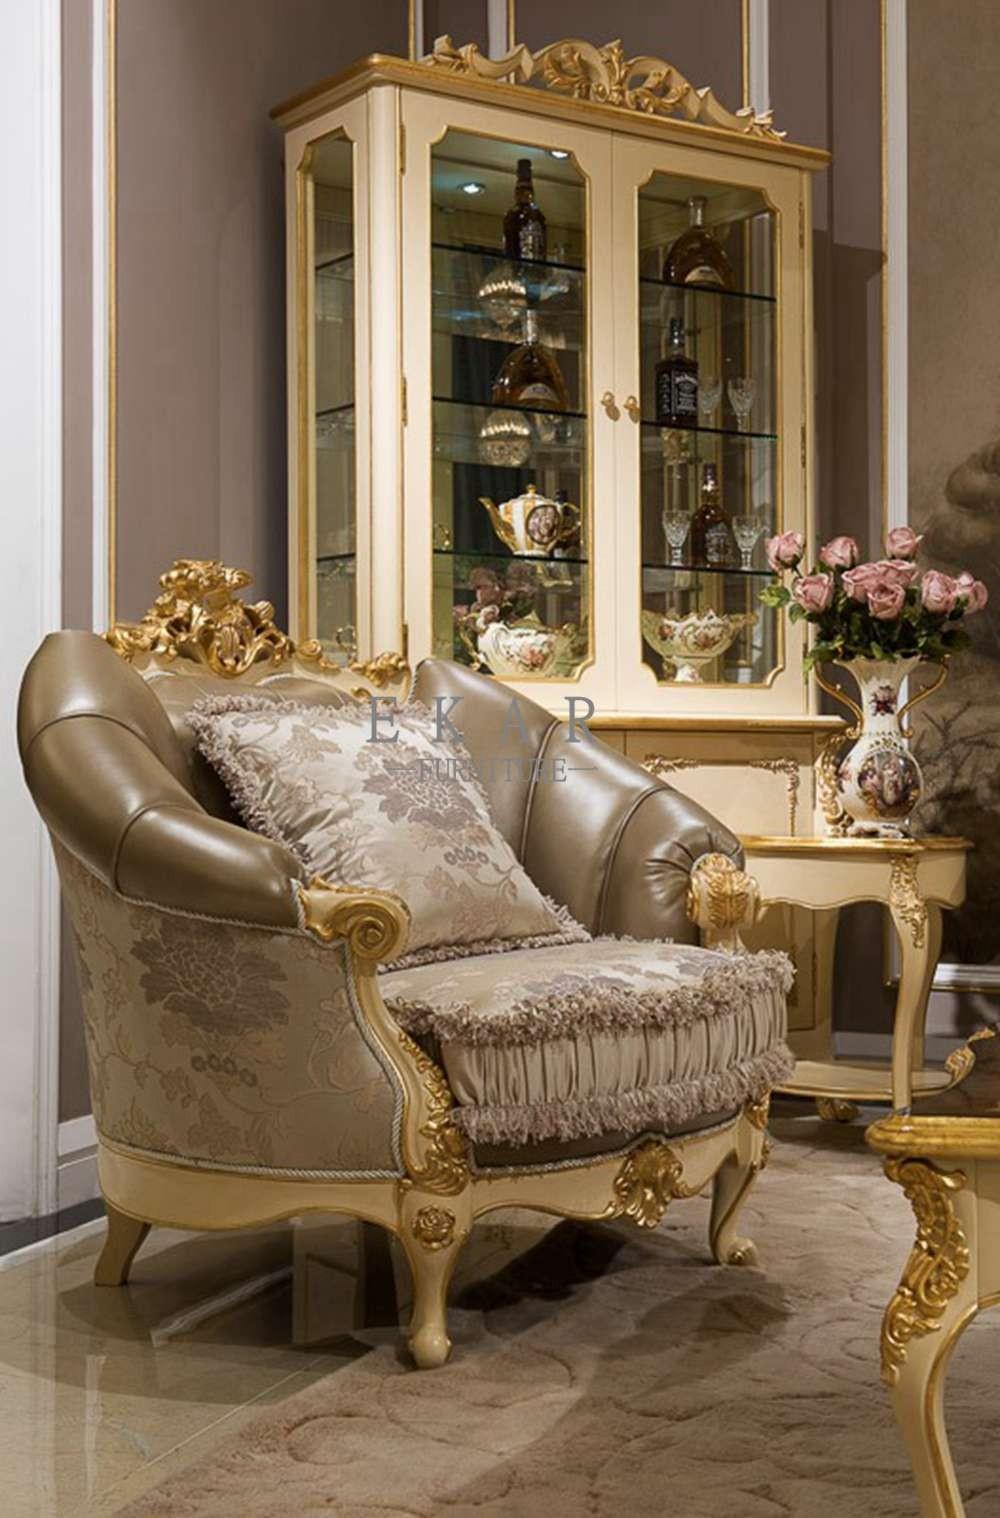 Wooden Furniture Living Room Designs: Ekar Furniture Design 7 Seater Heated Sofa Wood Living